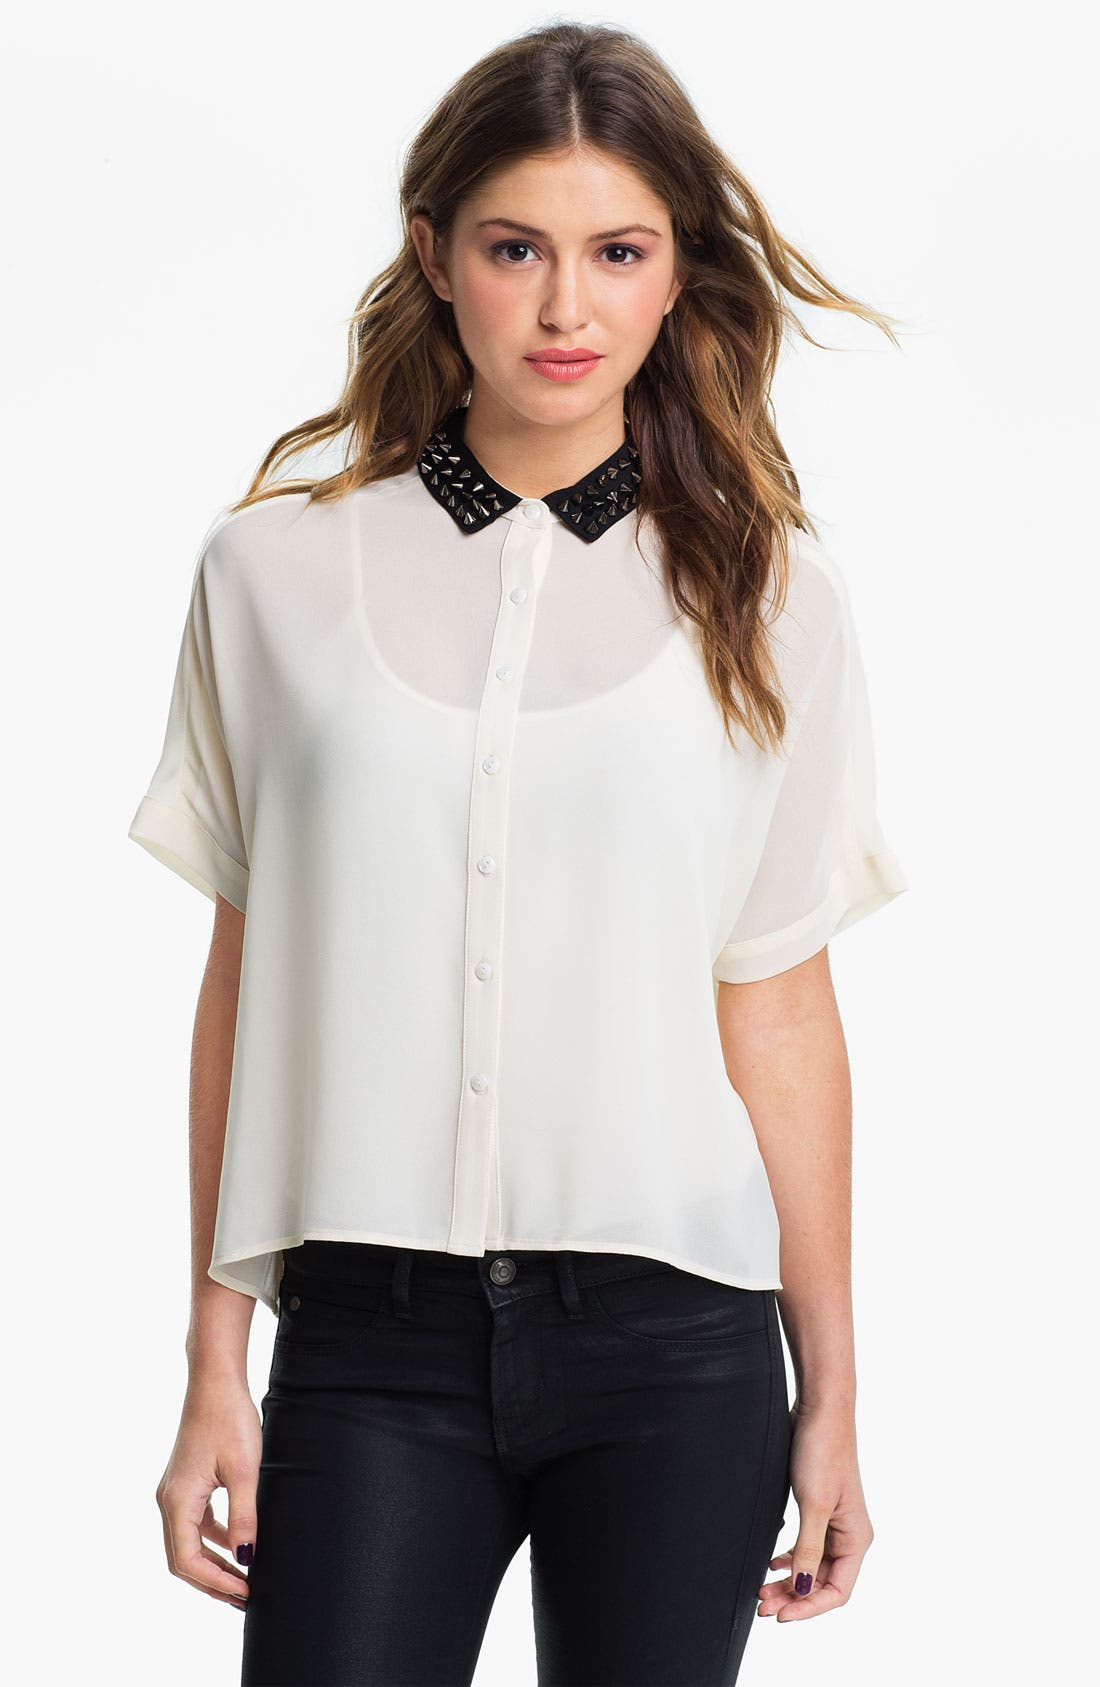 Alternate Image 1 Selected - Elodie Spike Stud Collar Shirt (Juniors)